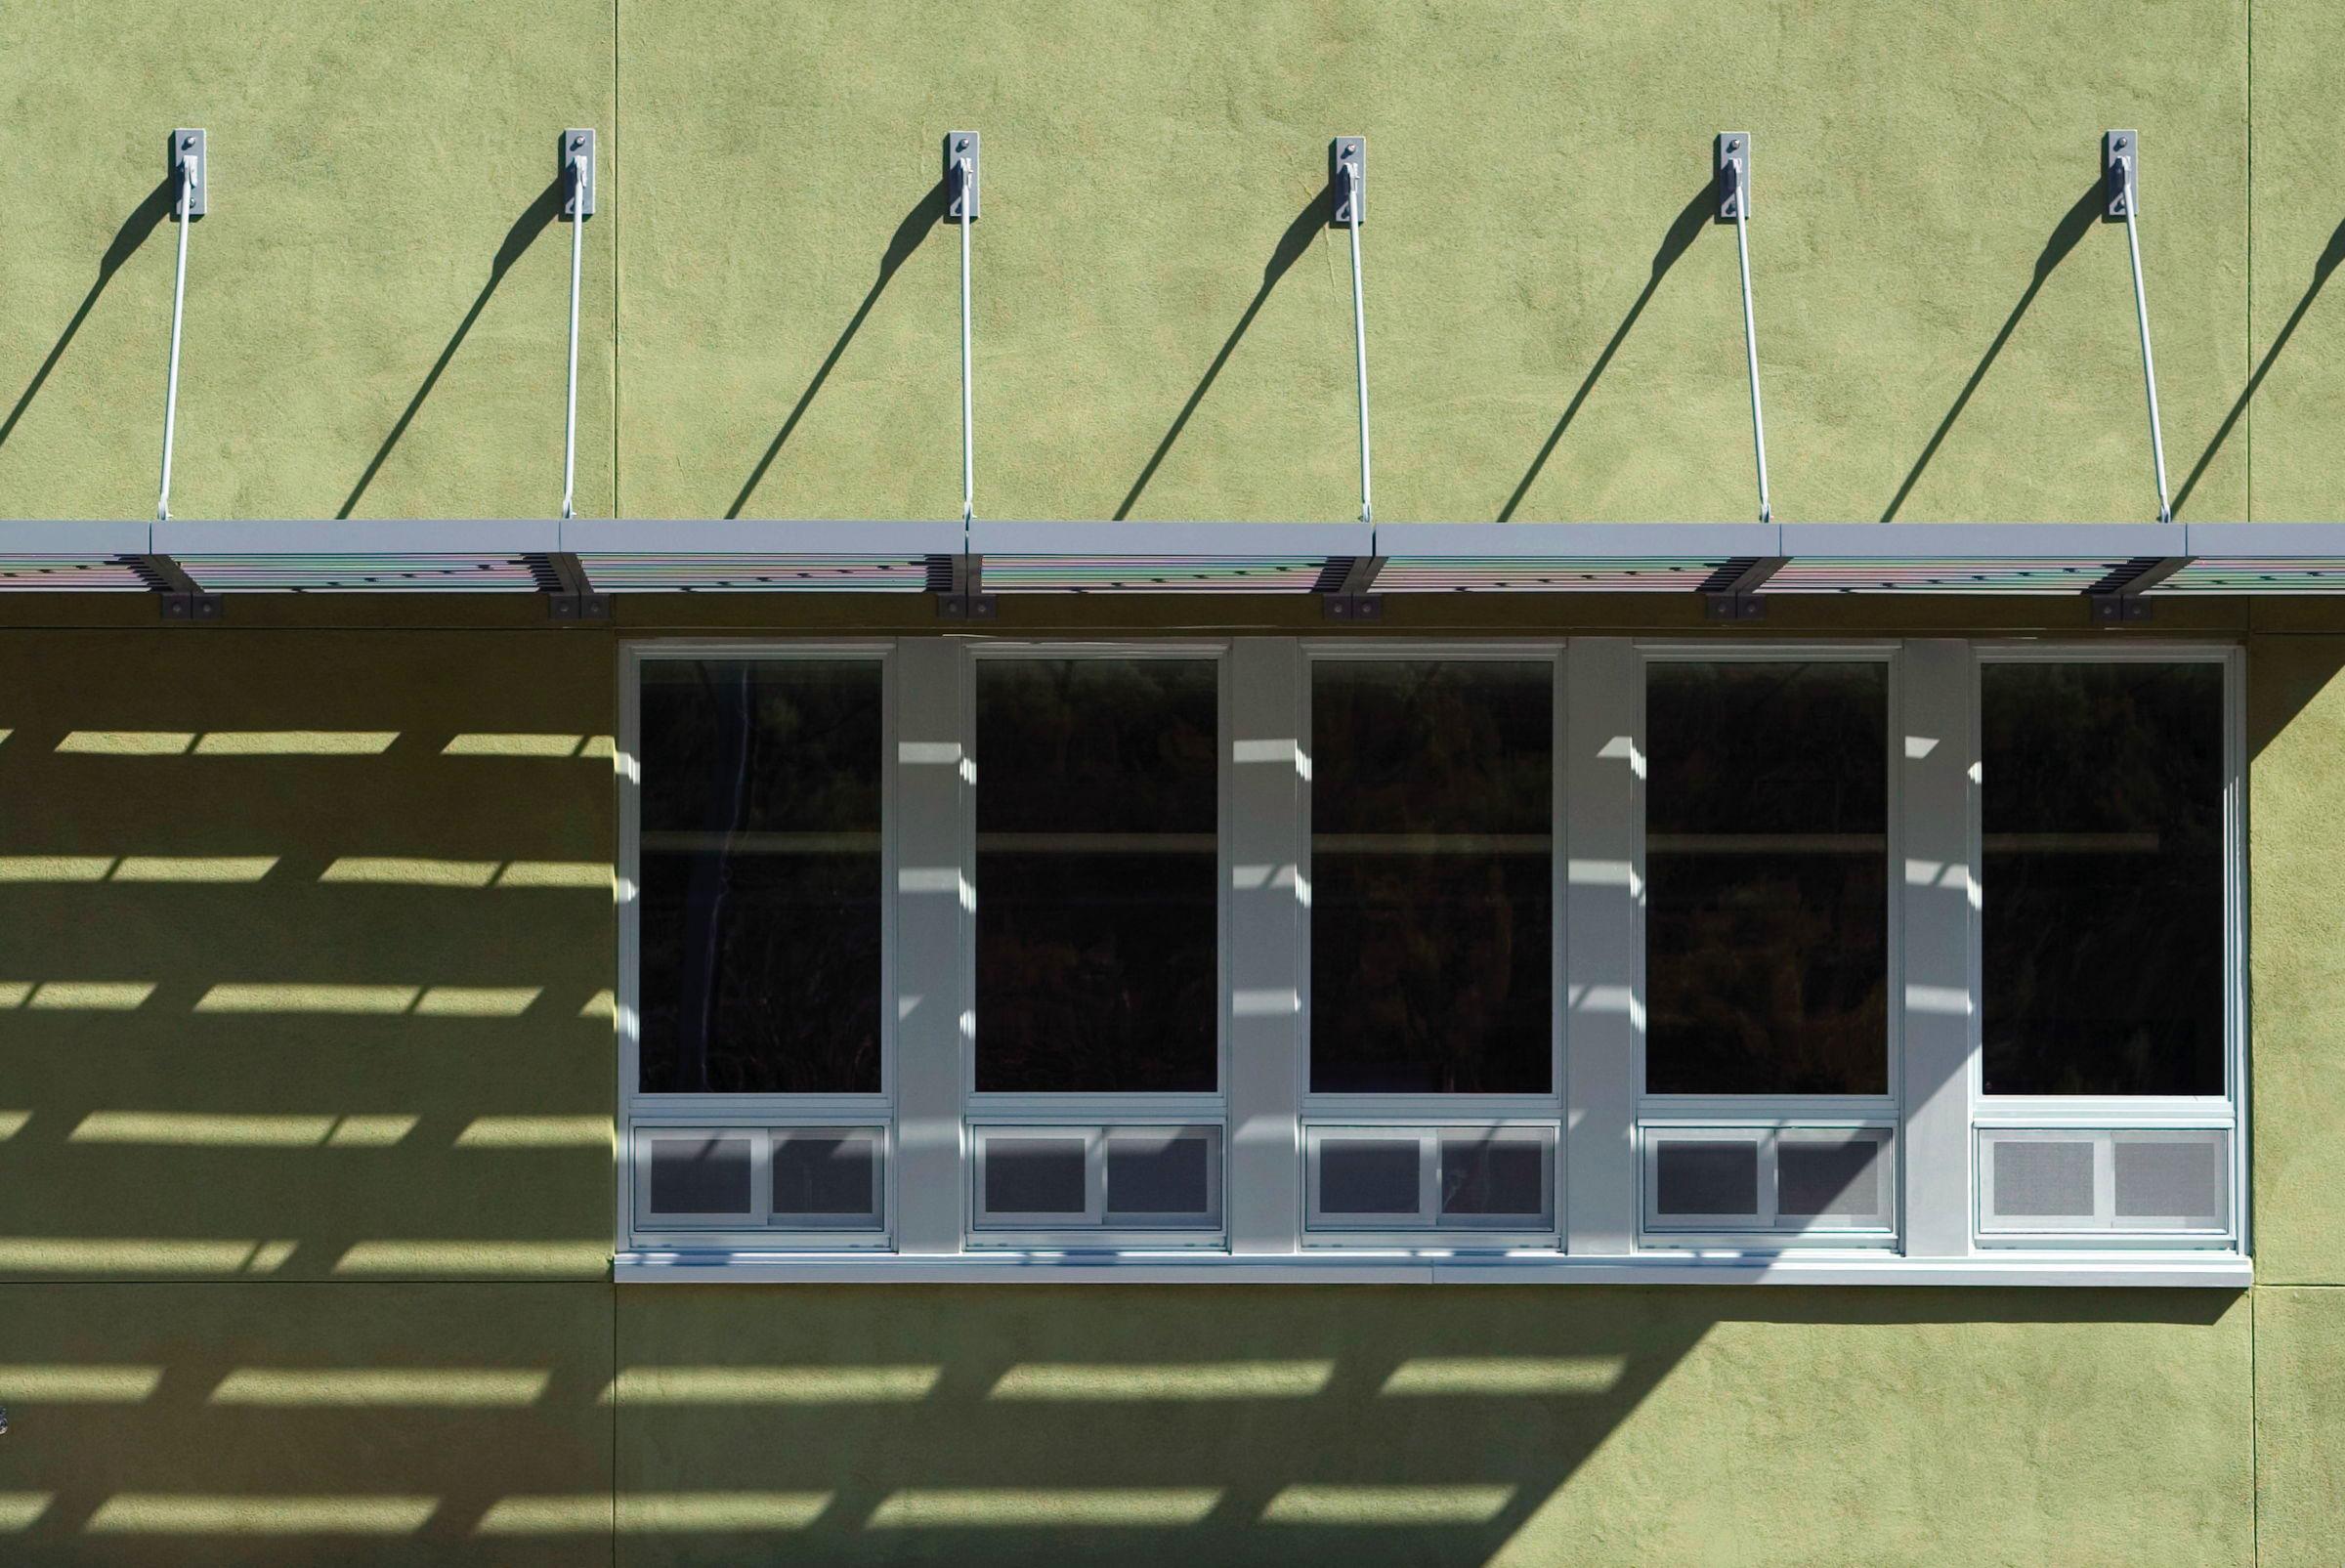 Sunshade blocks direct sunlight - provides natural daylighting